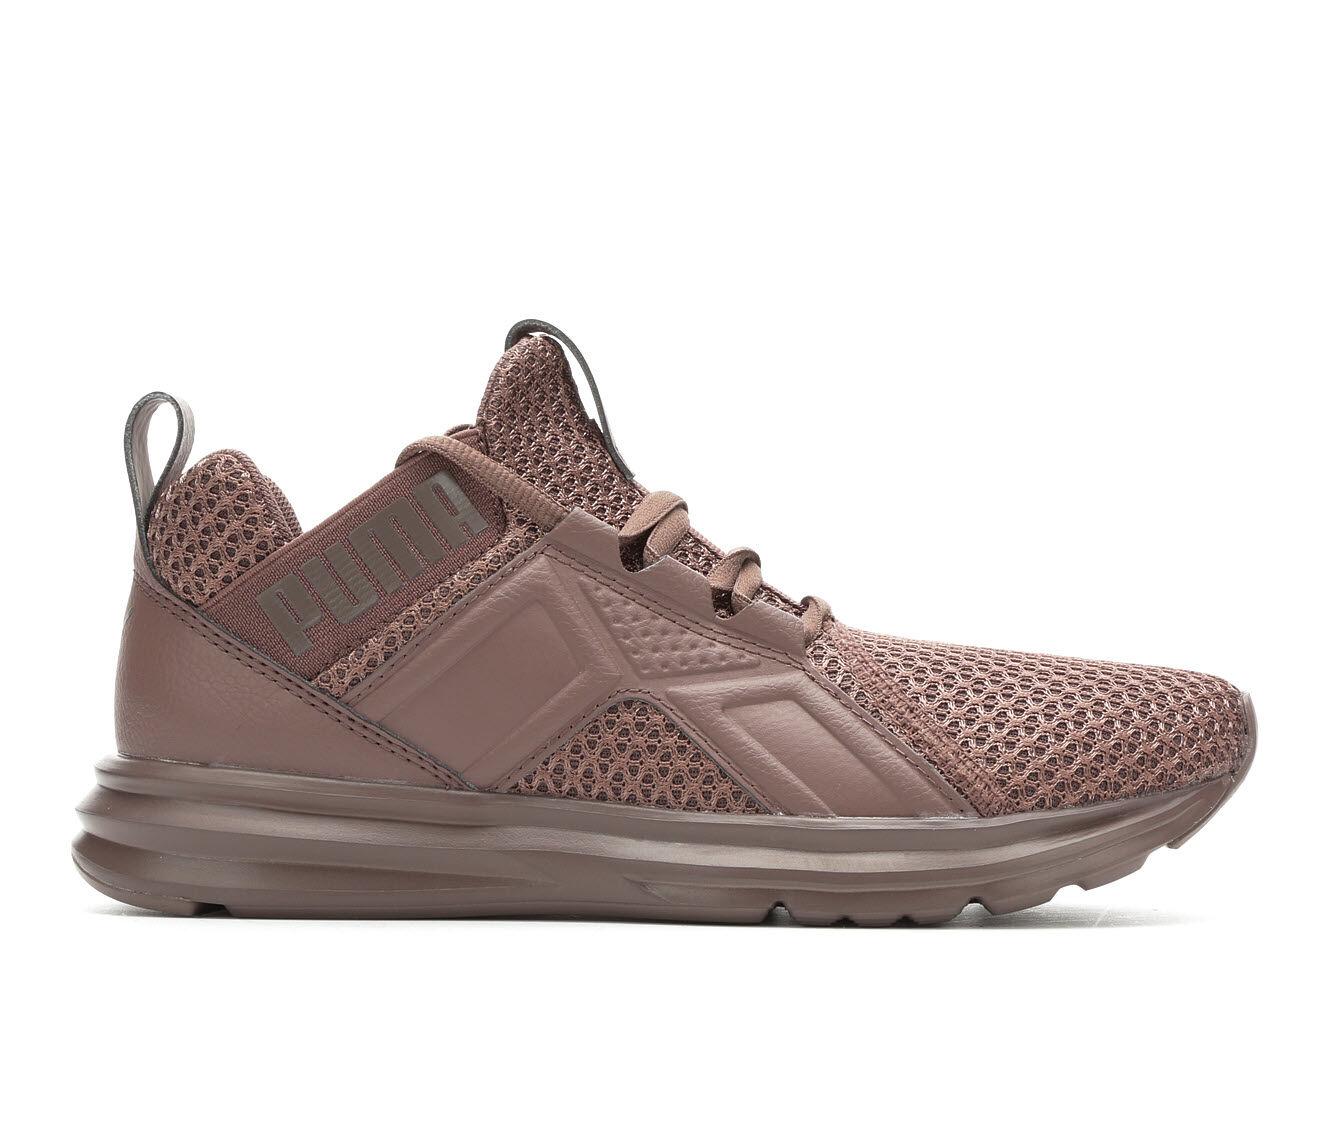 shop cheap new series Women's Puma Enzo Varsity High Top Slip-On Sneakers Peppercorn